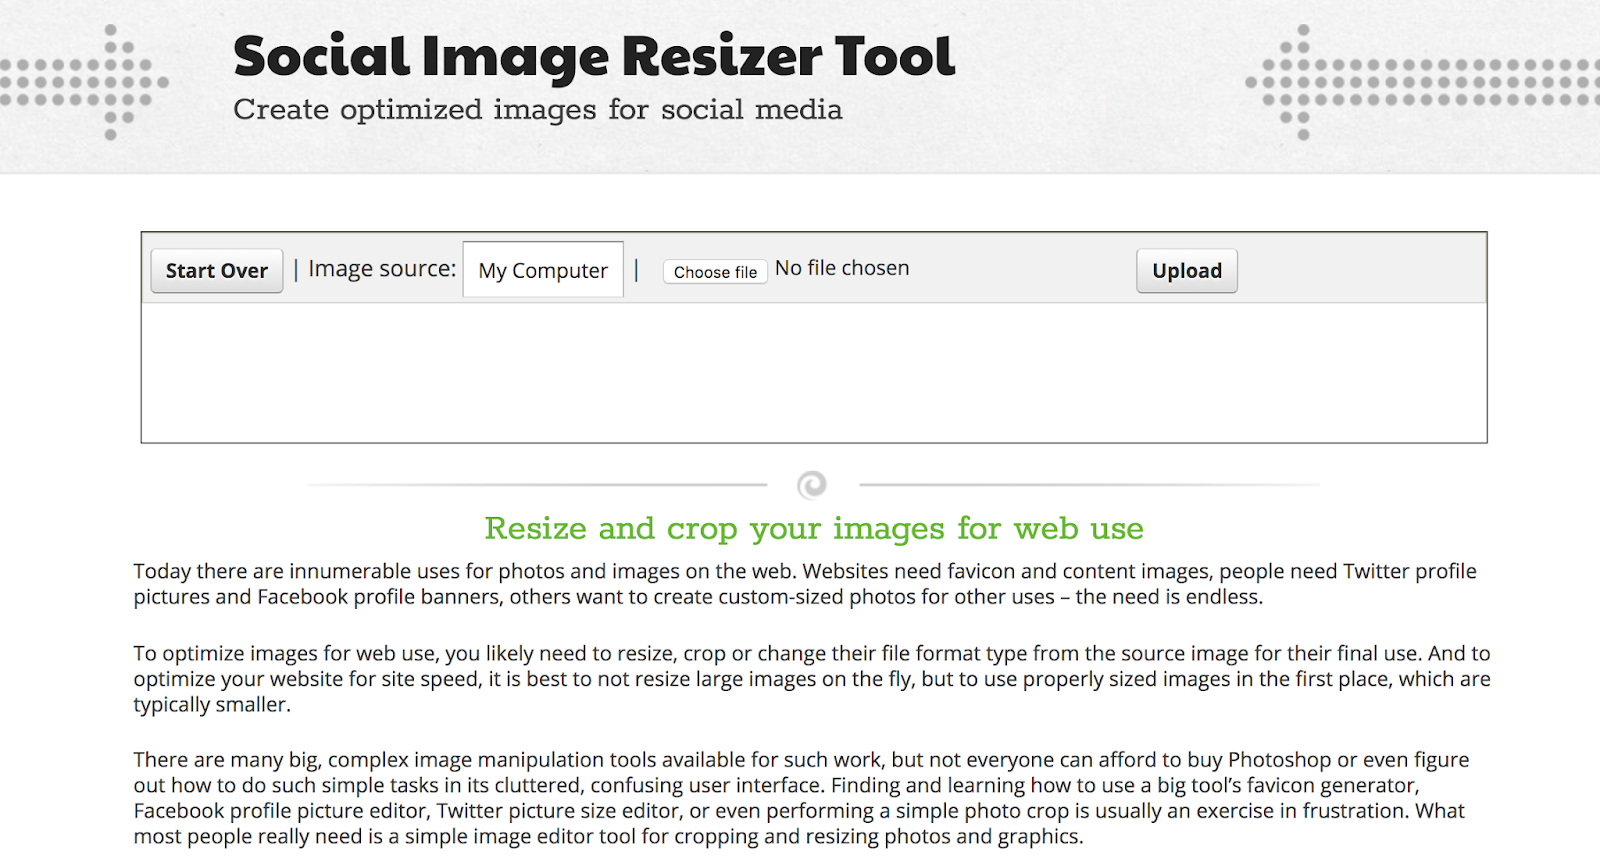 Social Image Resize Tool